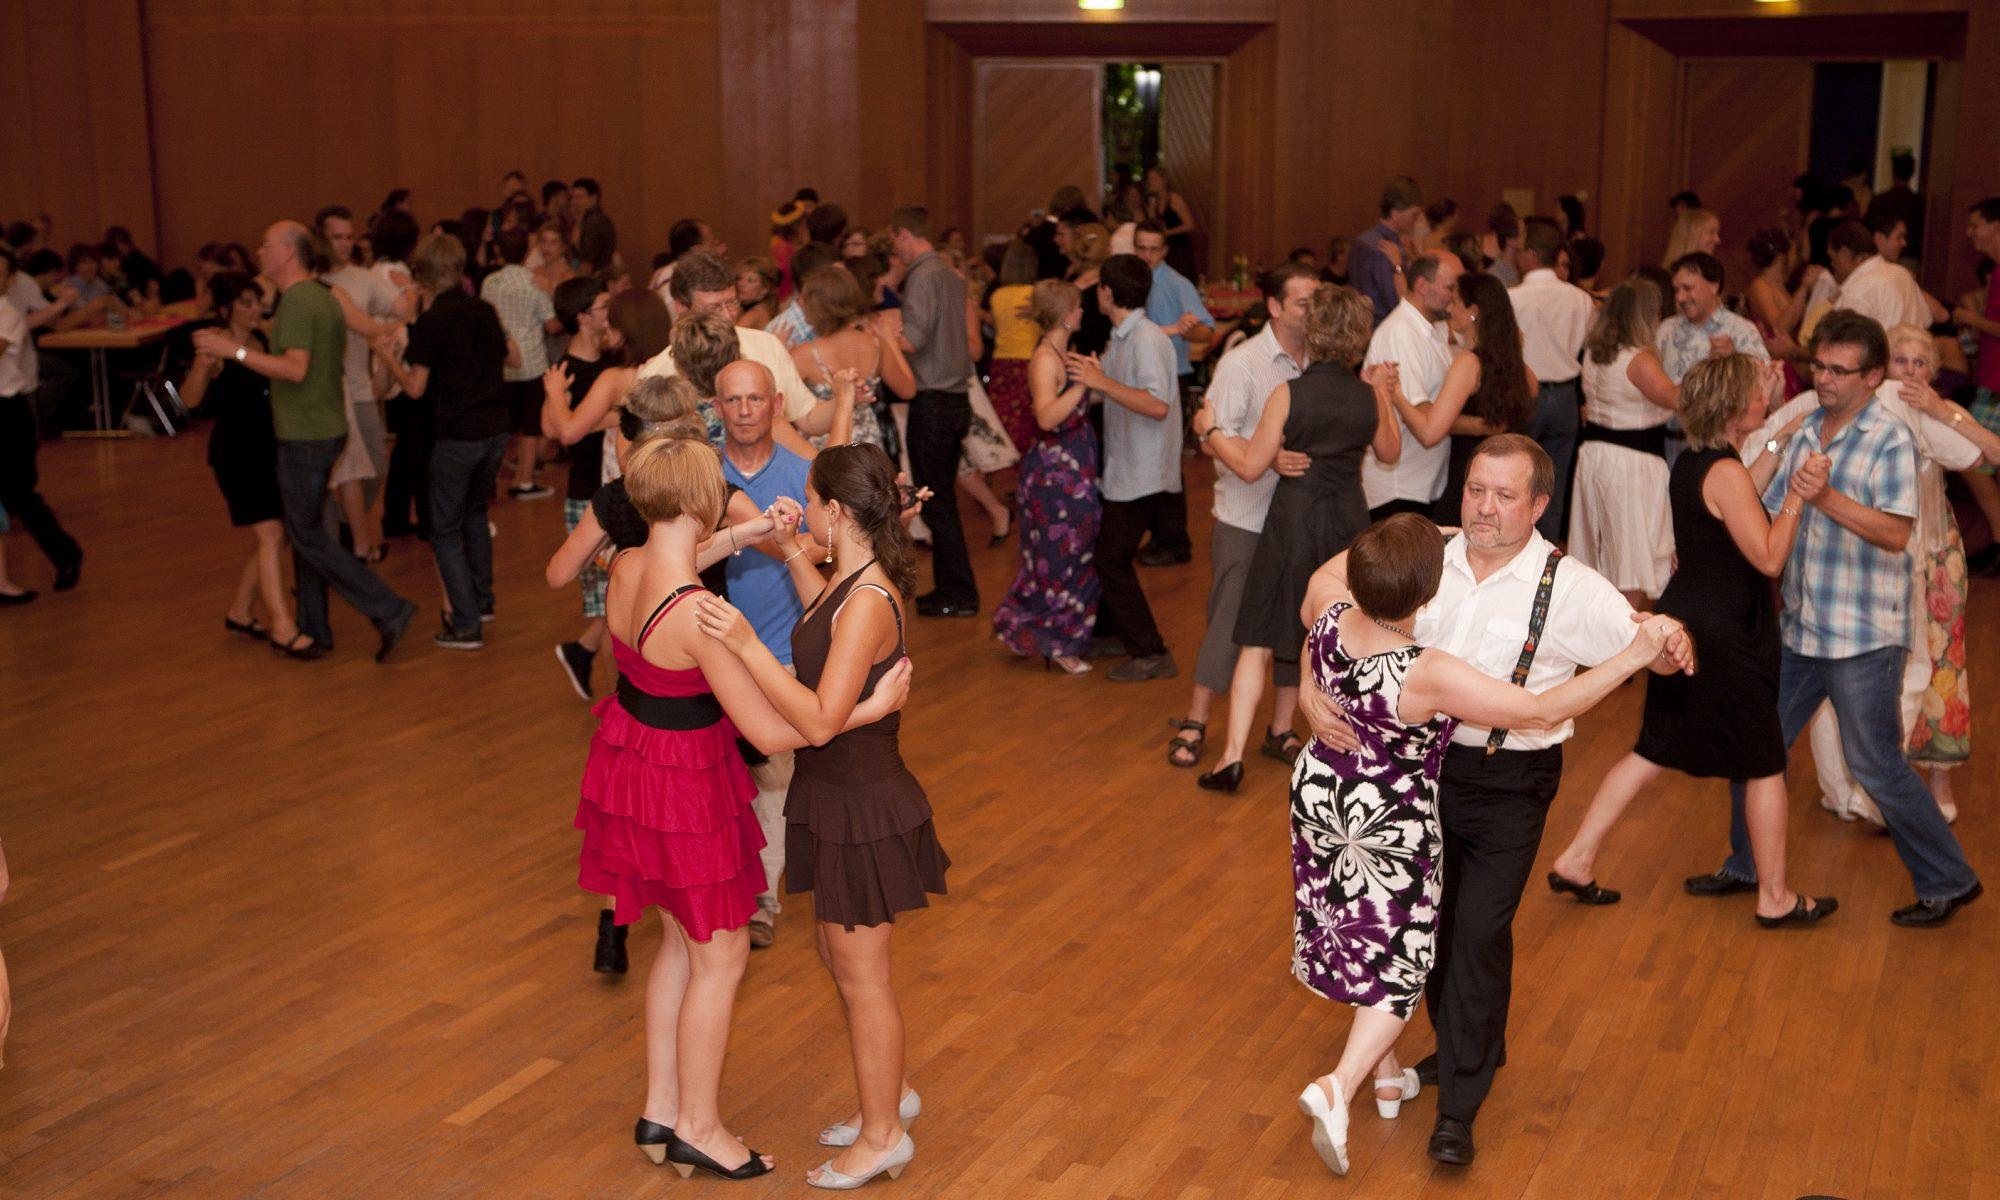 Tanzkurse für singles in bielefeld